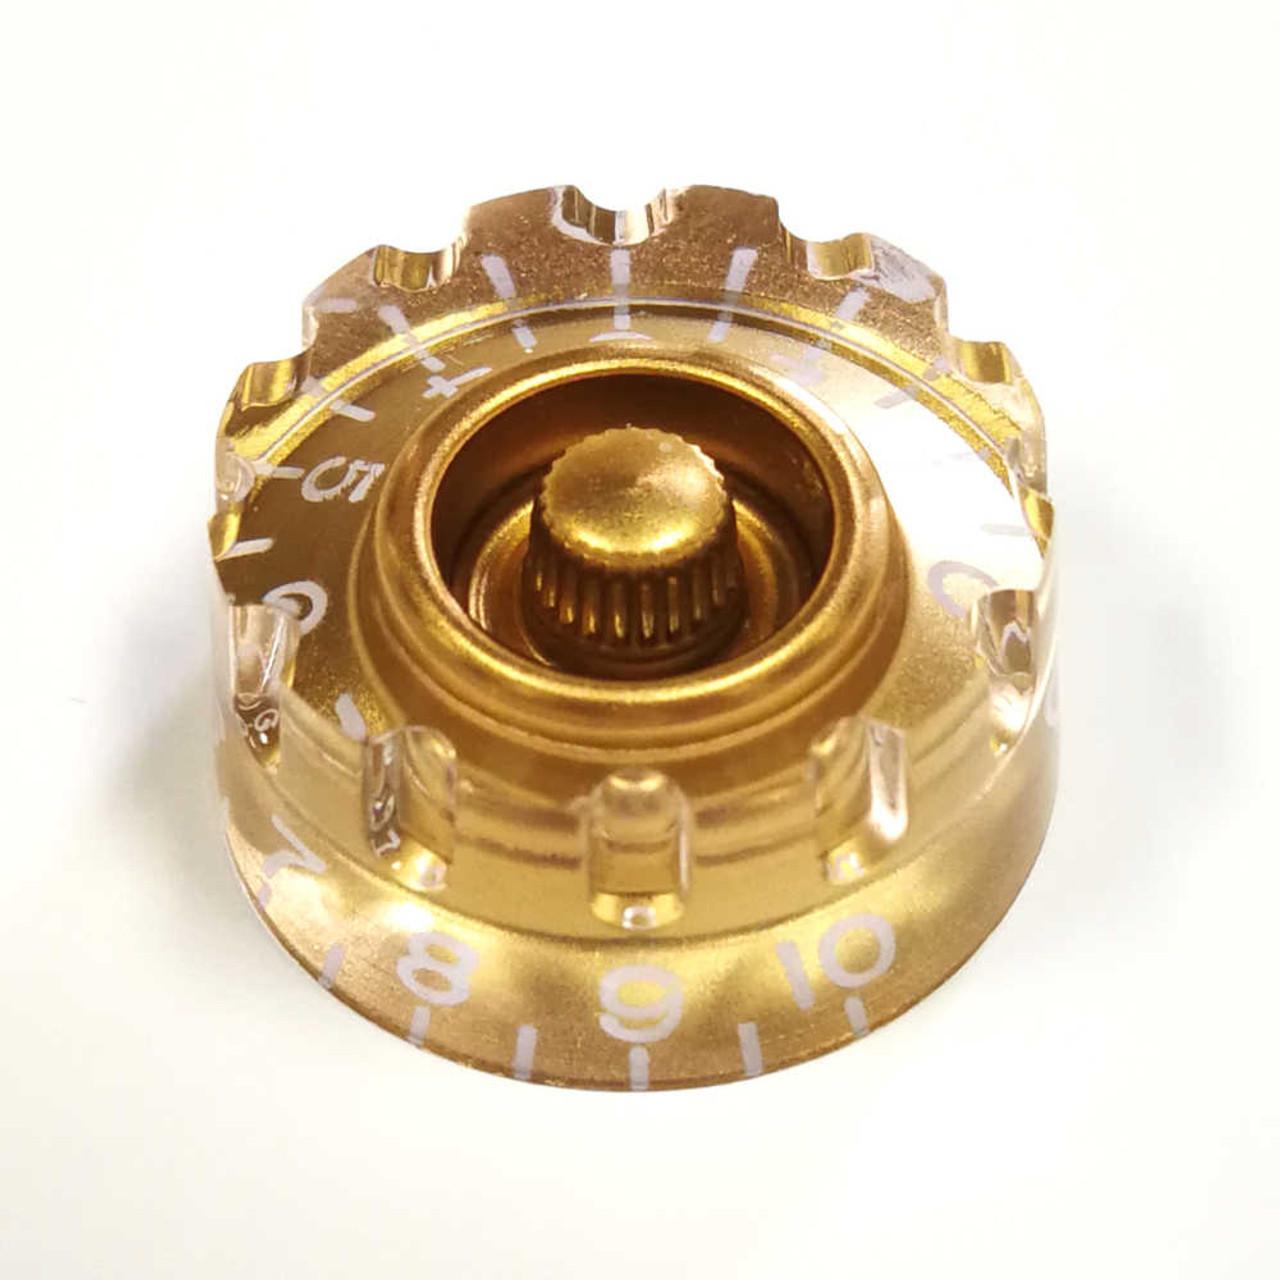 Knurled Speed Knob - 24-spline Gold